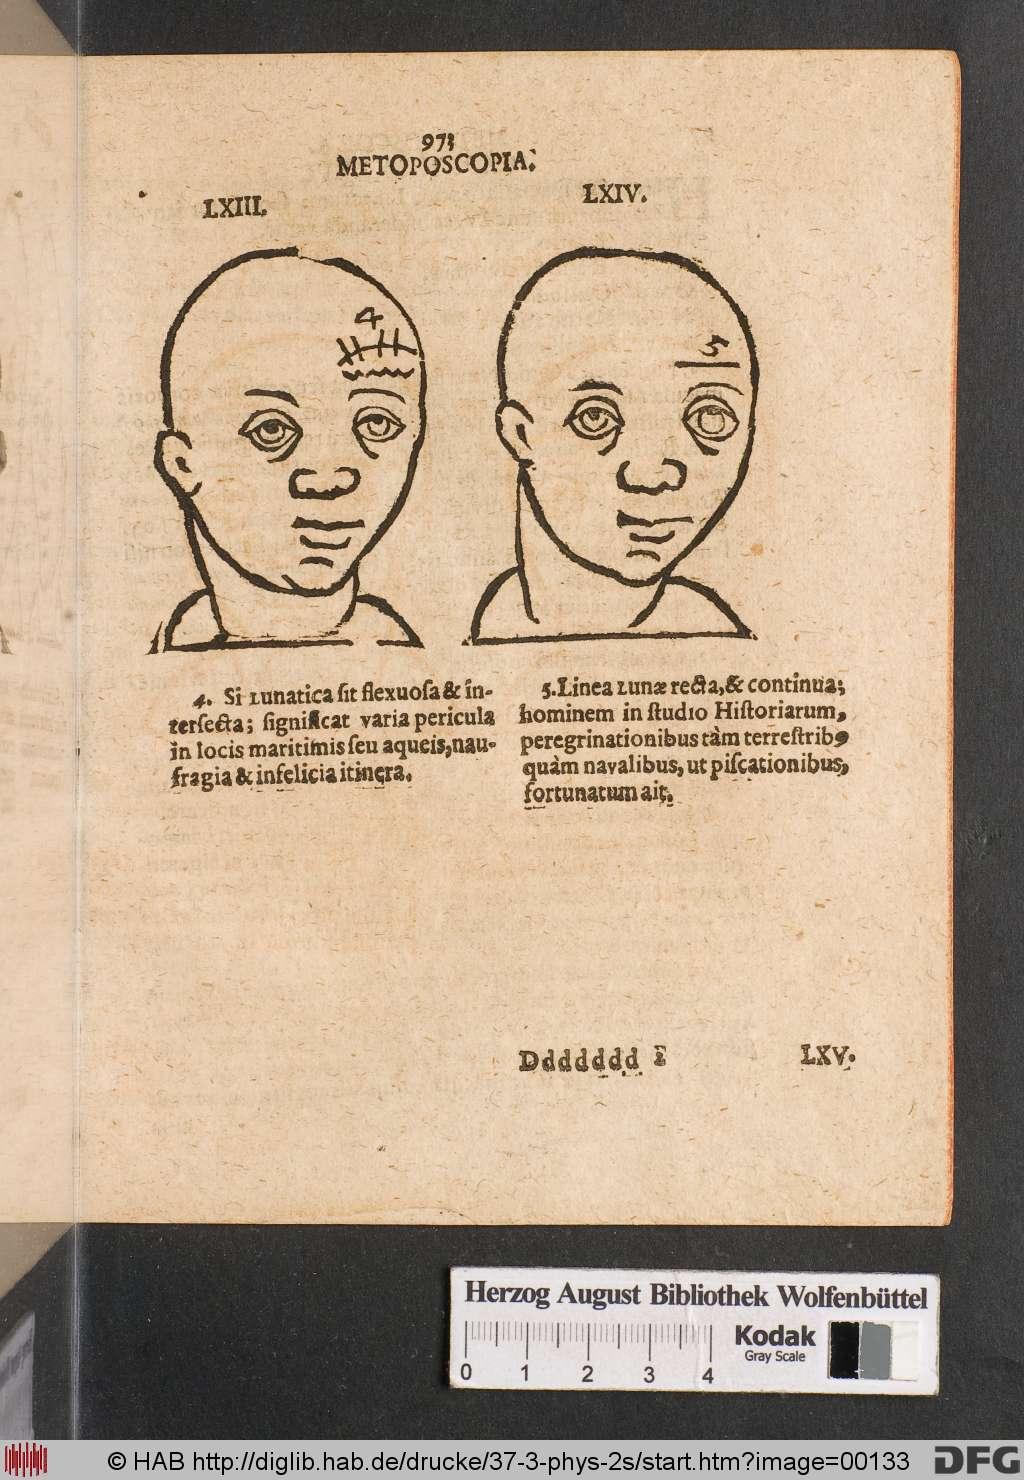 http://diglib.hab.de/drucke/37-3-phys-2s/00133.jpg